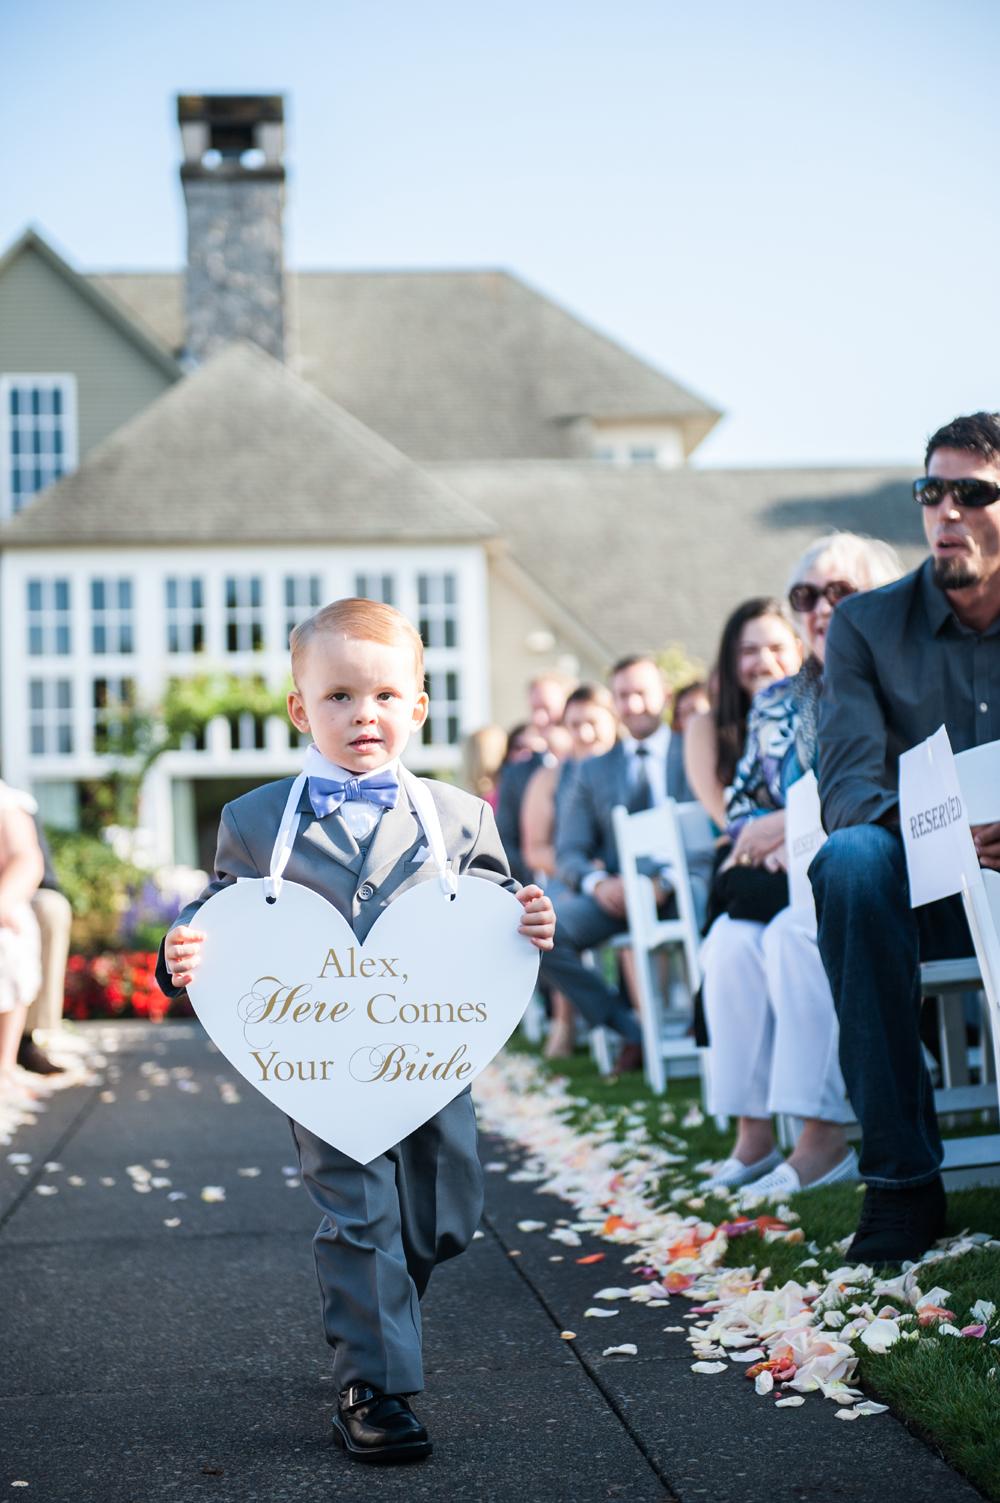 Bridalbliss.com | Portland Wedding| Oregon Event Planning and Design | Jennifer Morey Photography